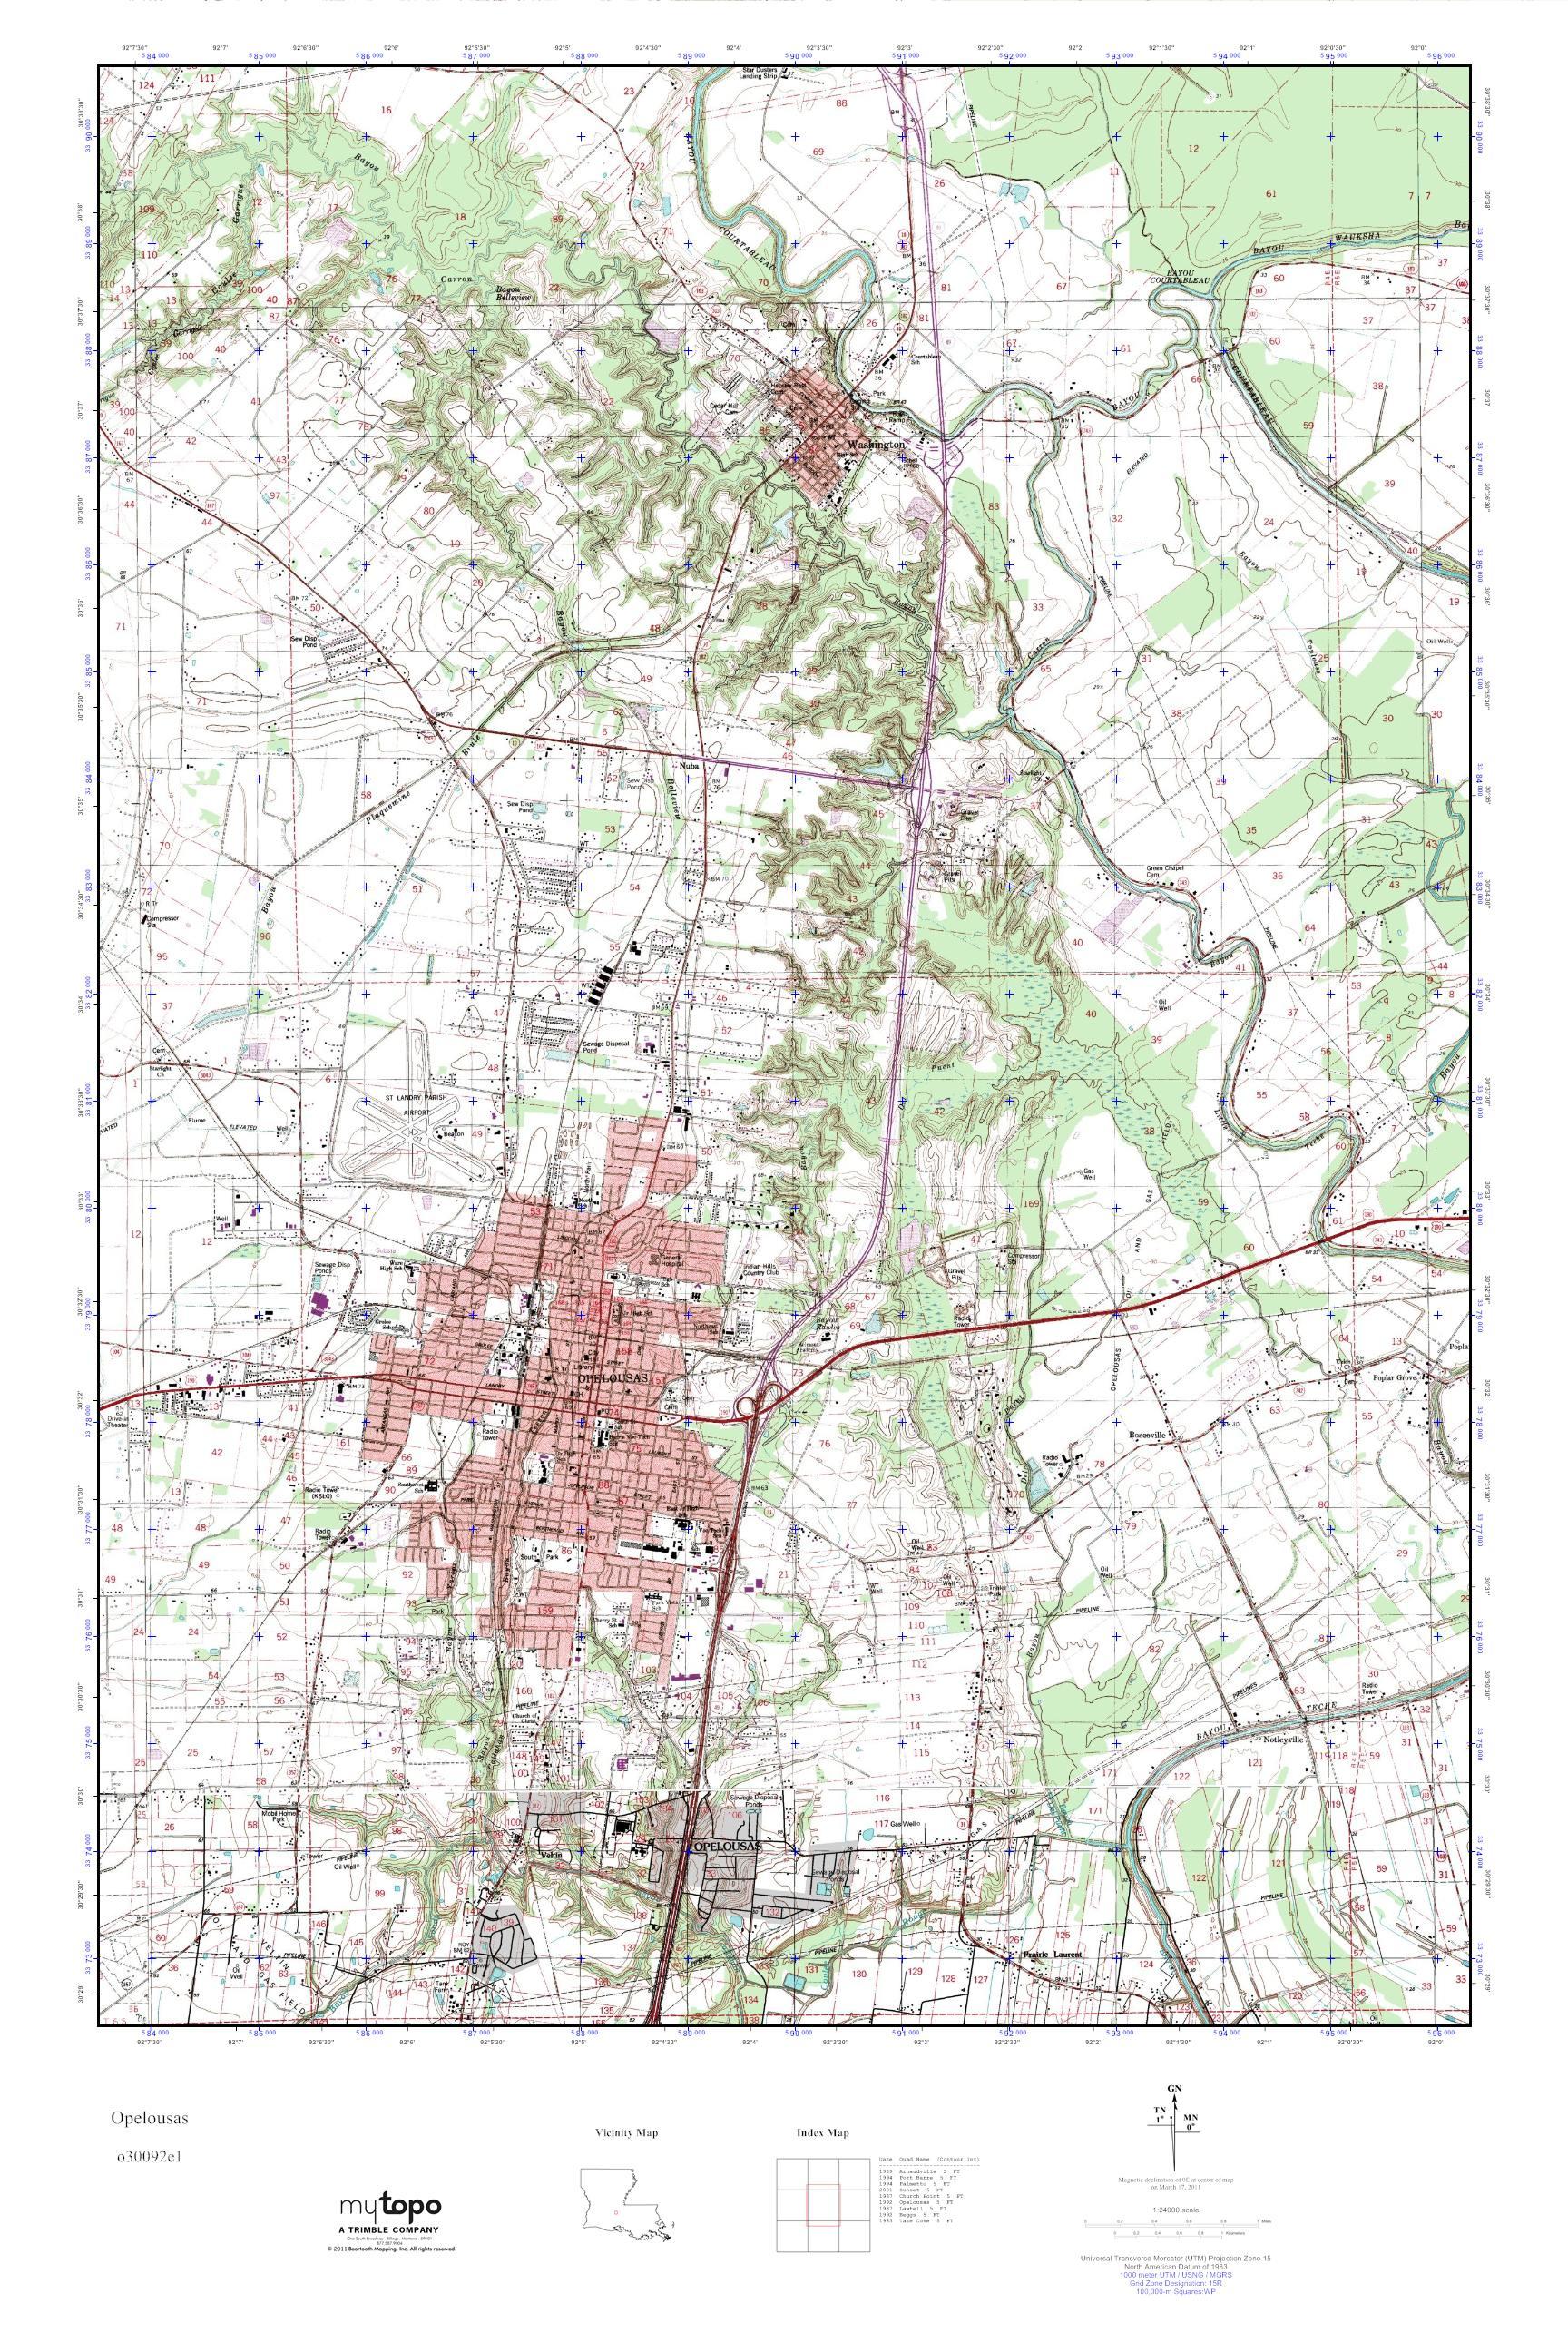 Opelousas Louisiana Map.Mytopo Opelousas Louisiana Usgs Quad Topo Map